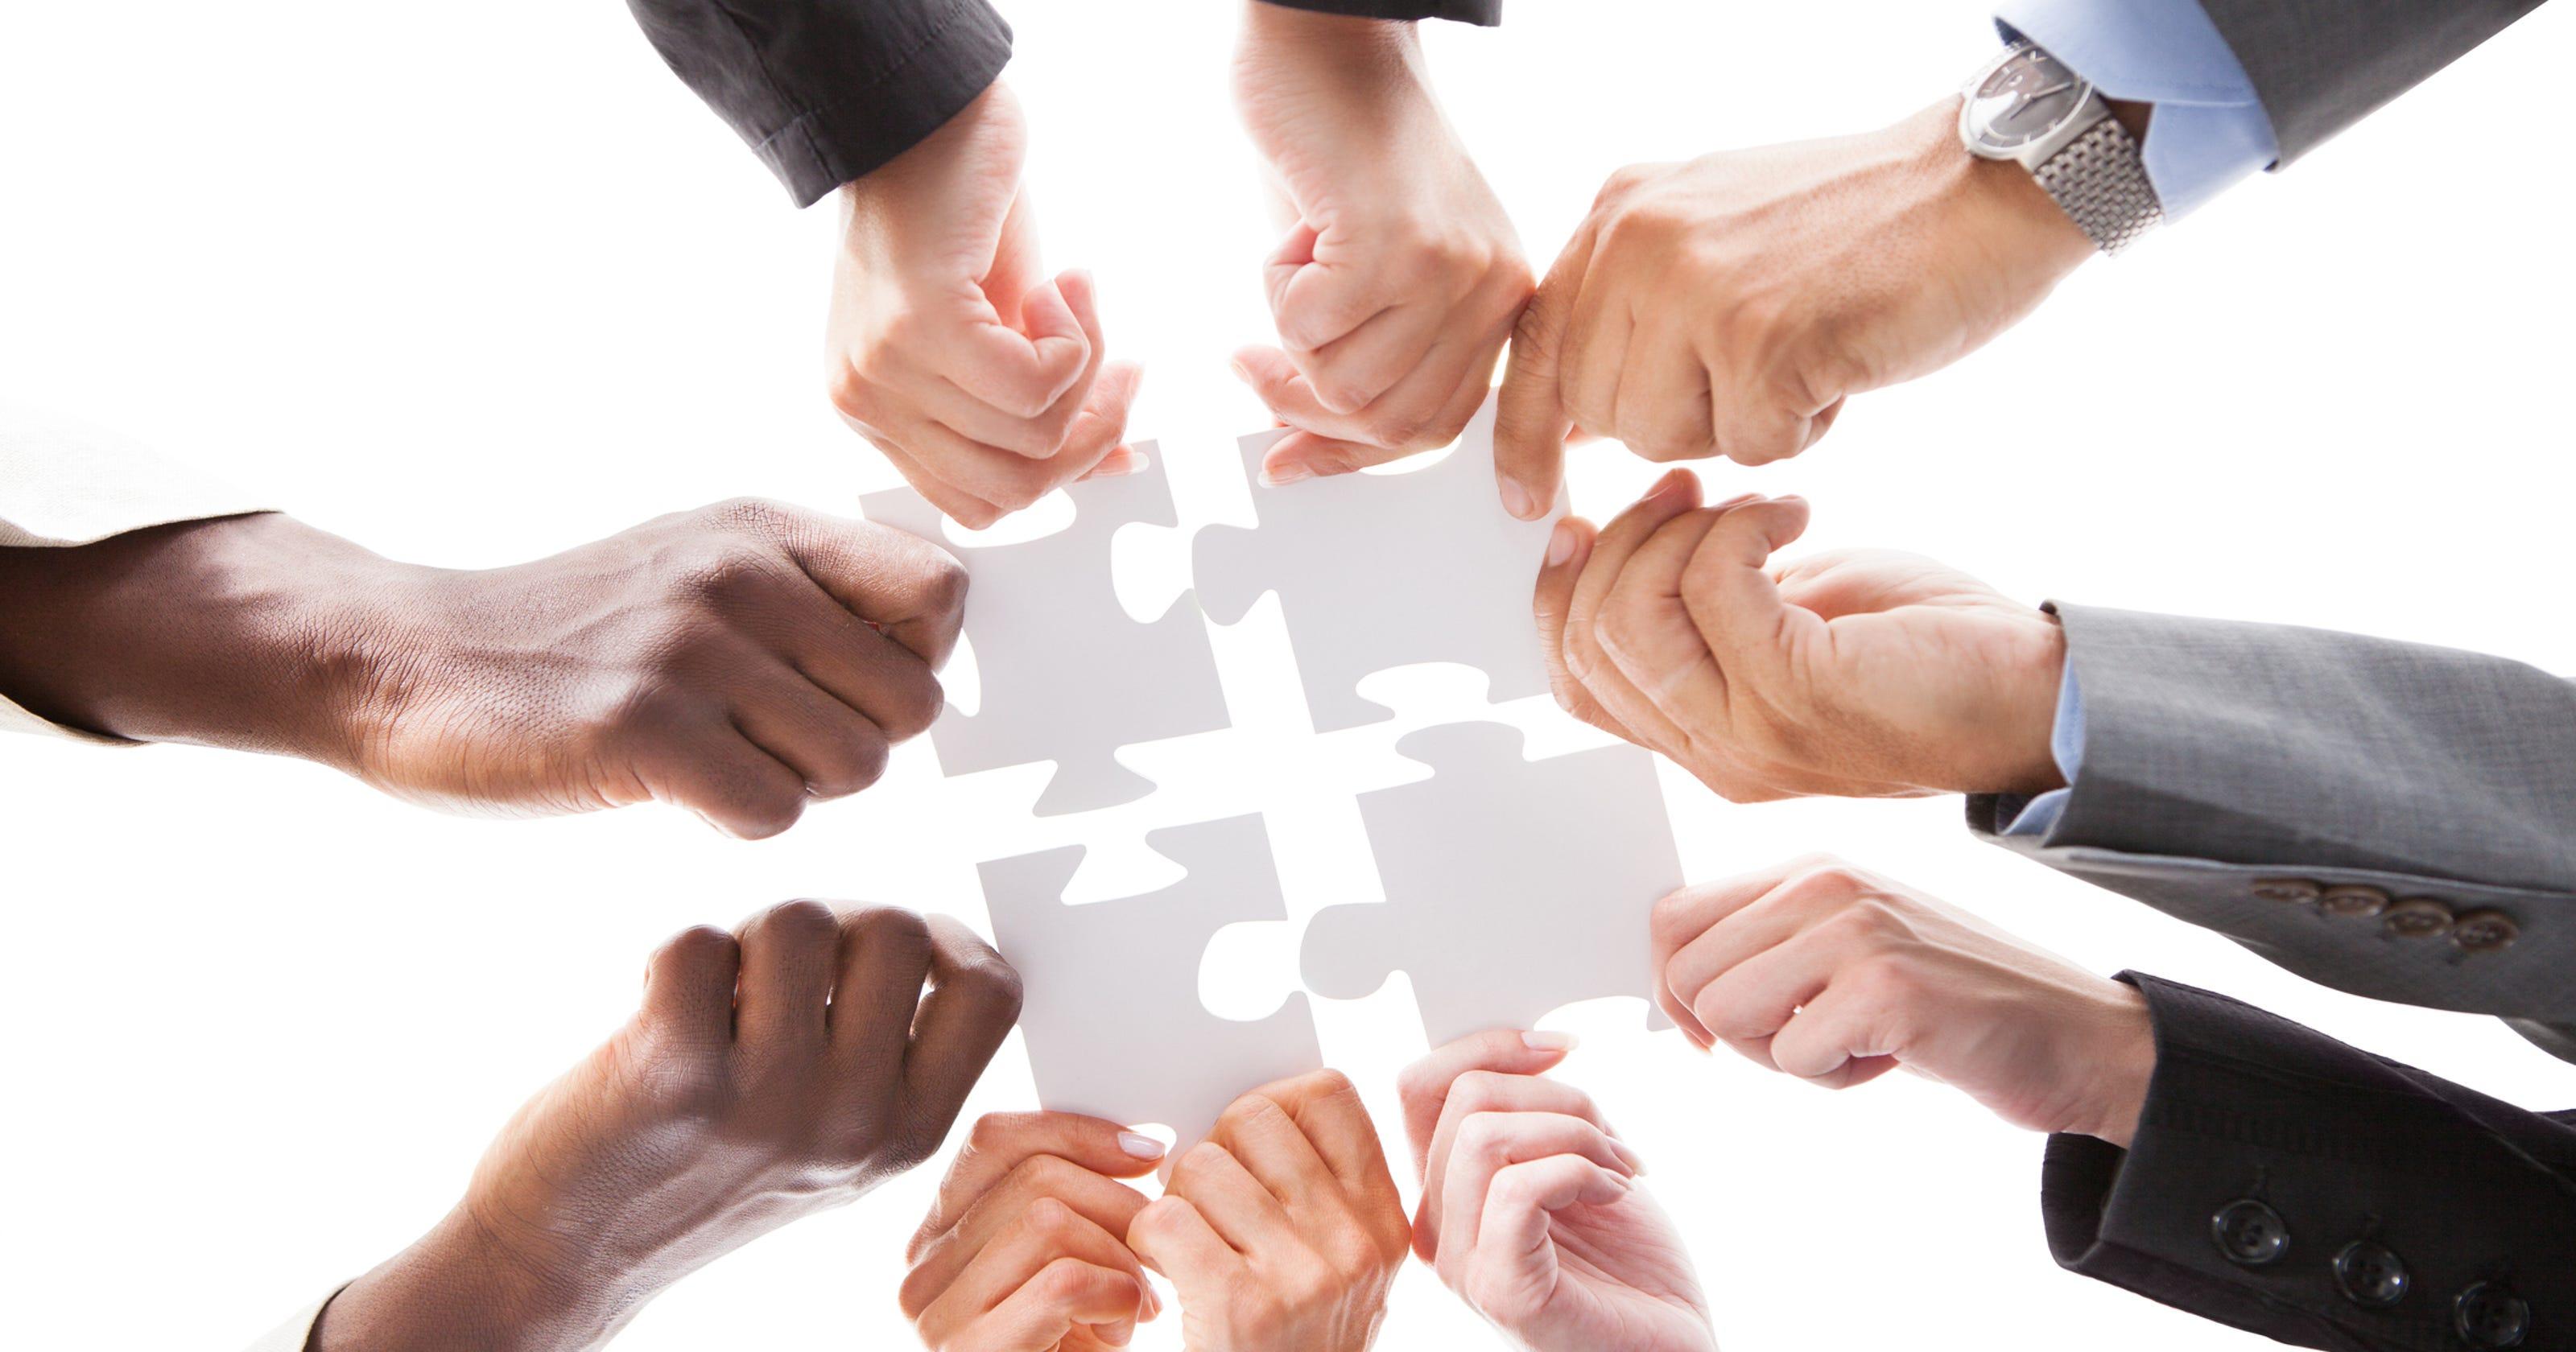 teamwork acti improving communication - HD2122×1415